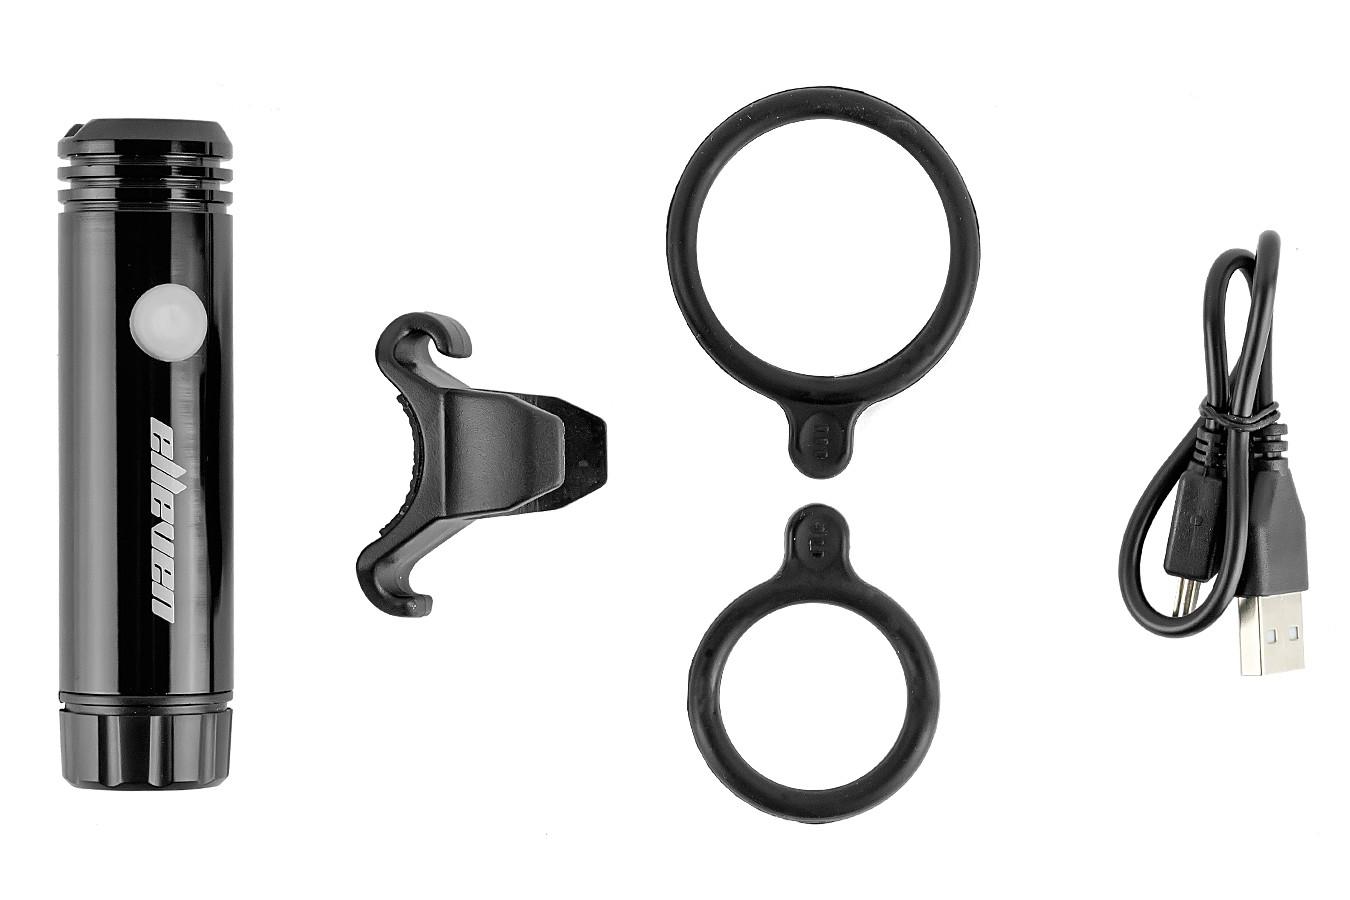 Farol CREE LED 3W Recarregável USB - Elleven